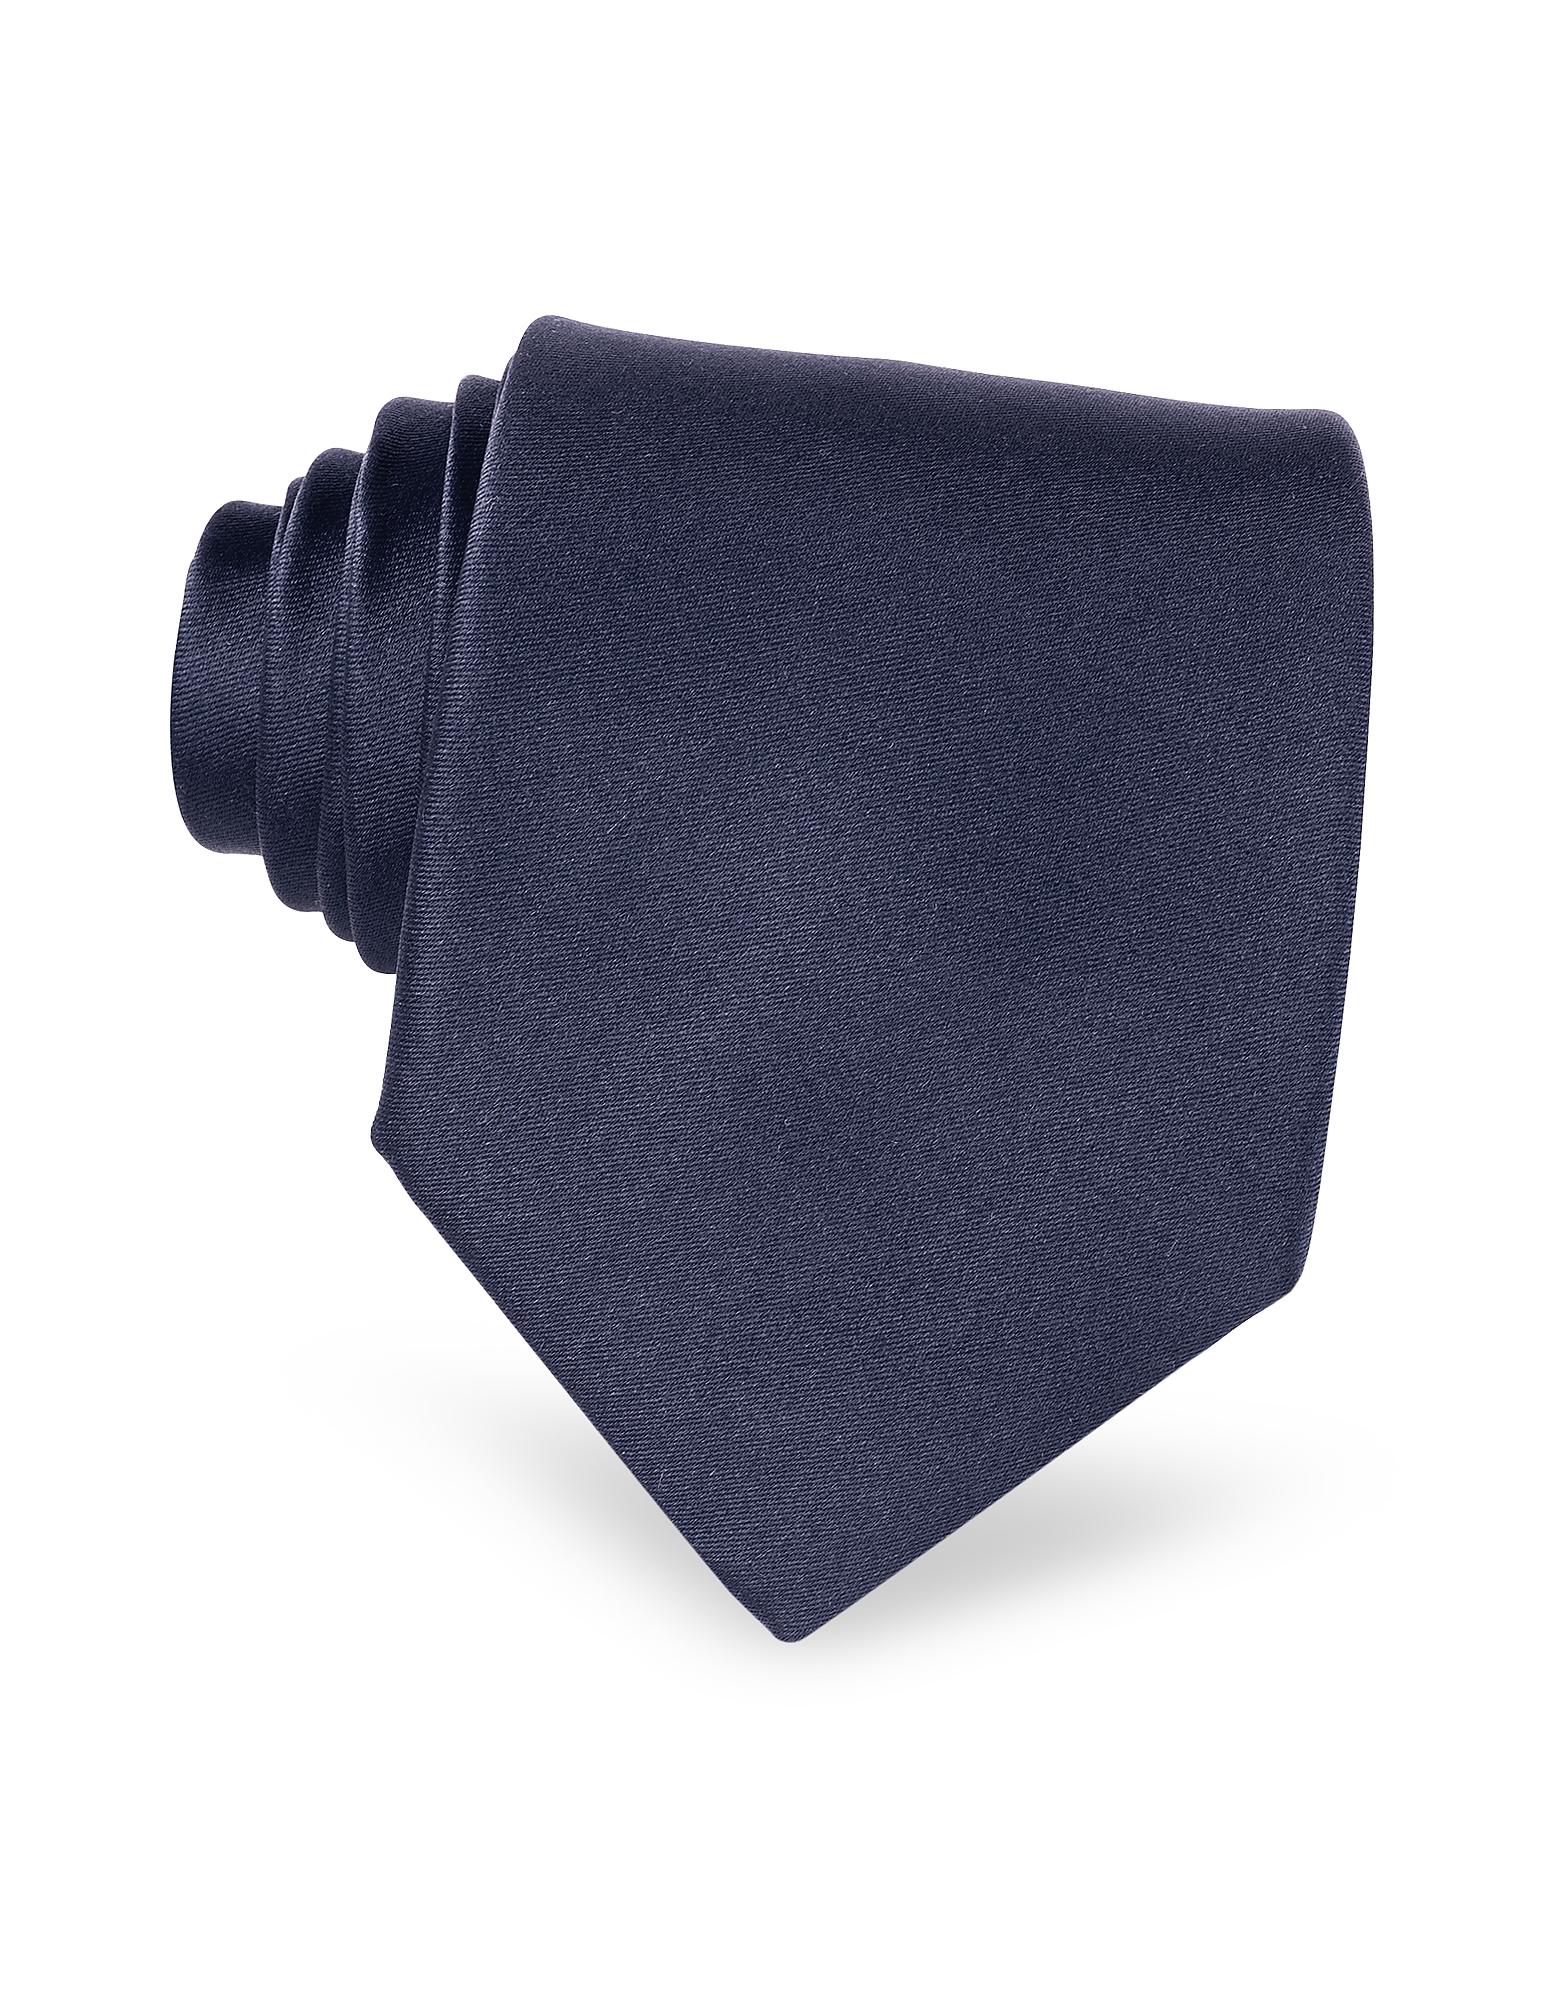 Forzieri Designer Ties, Dark Blue Solid Smooth Silk Tie